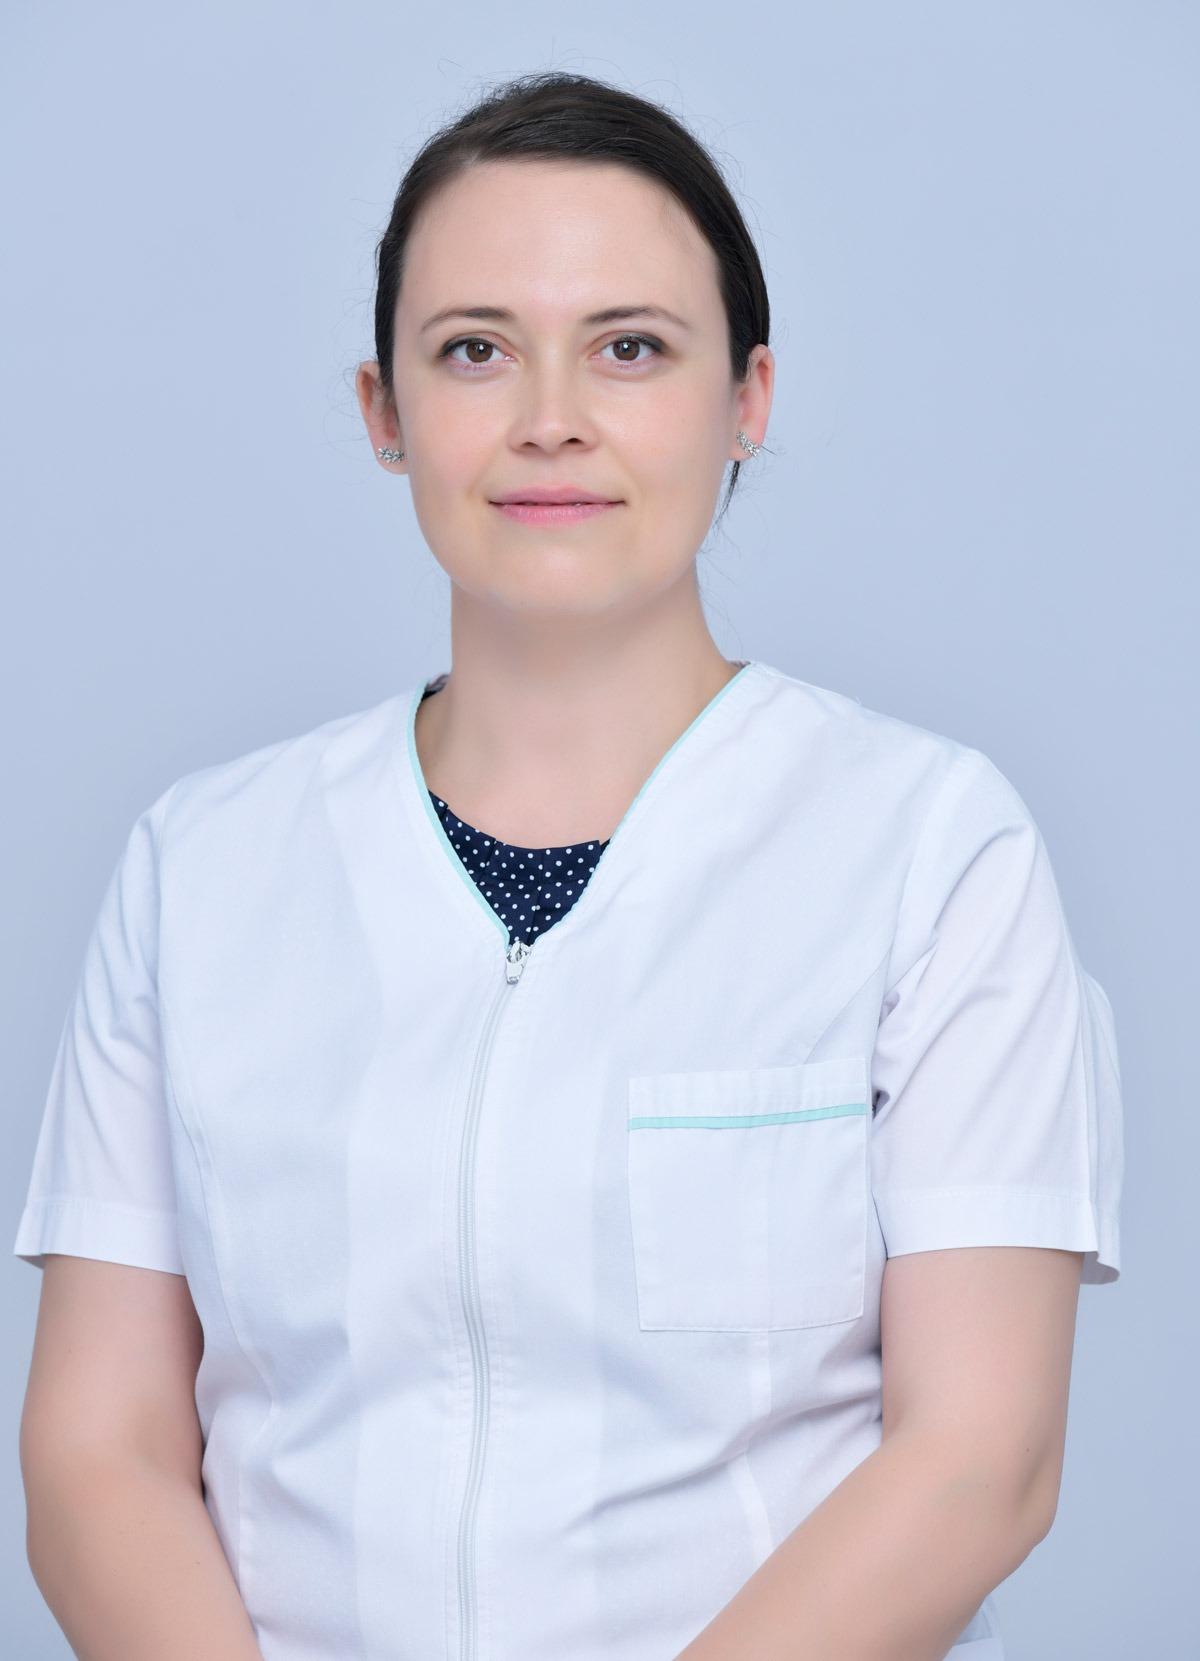 Doctor Mihaela Sarbu